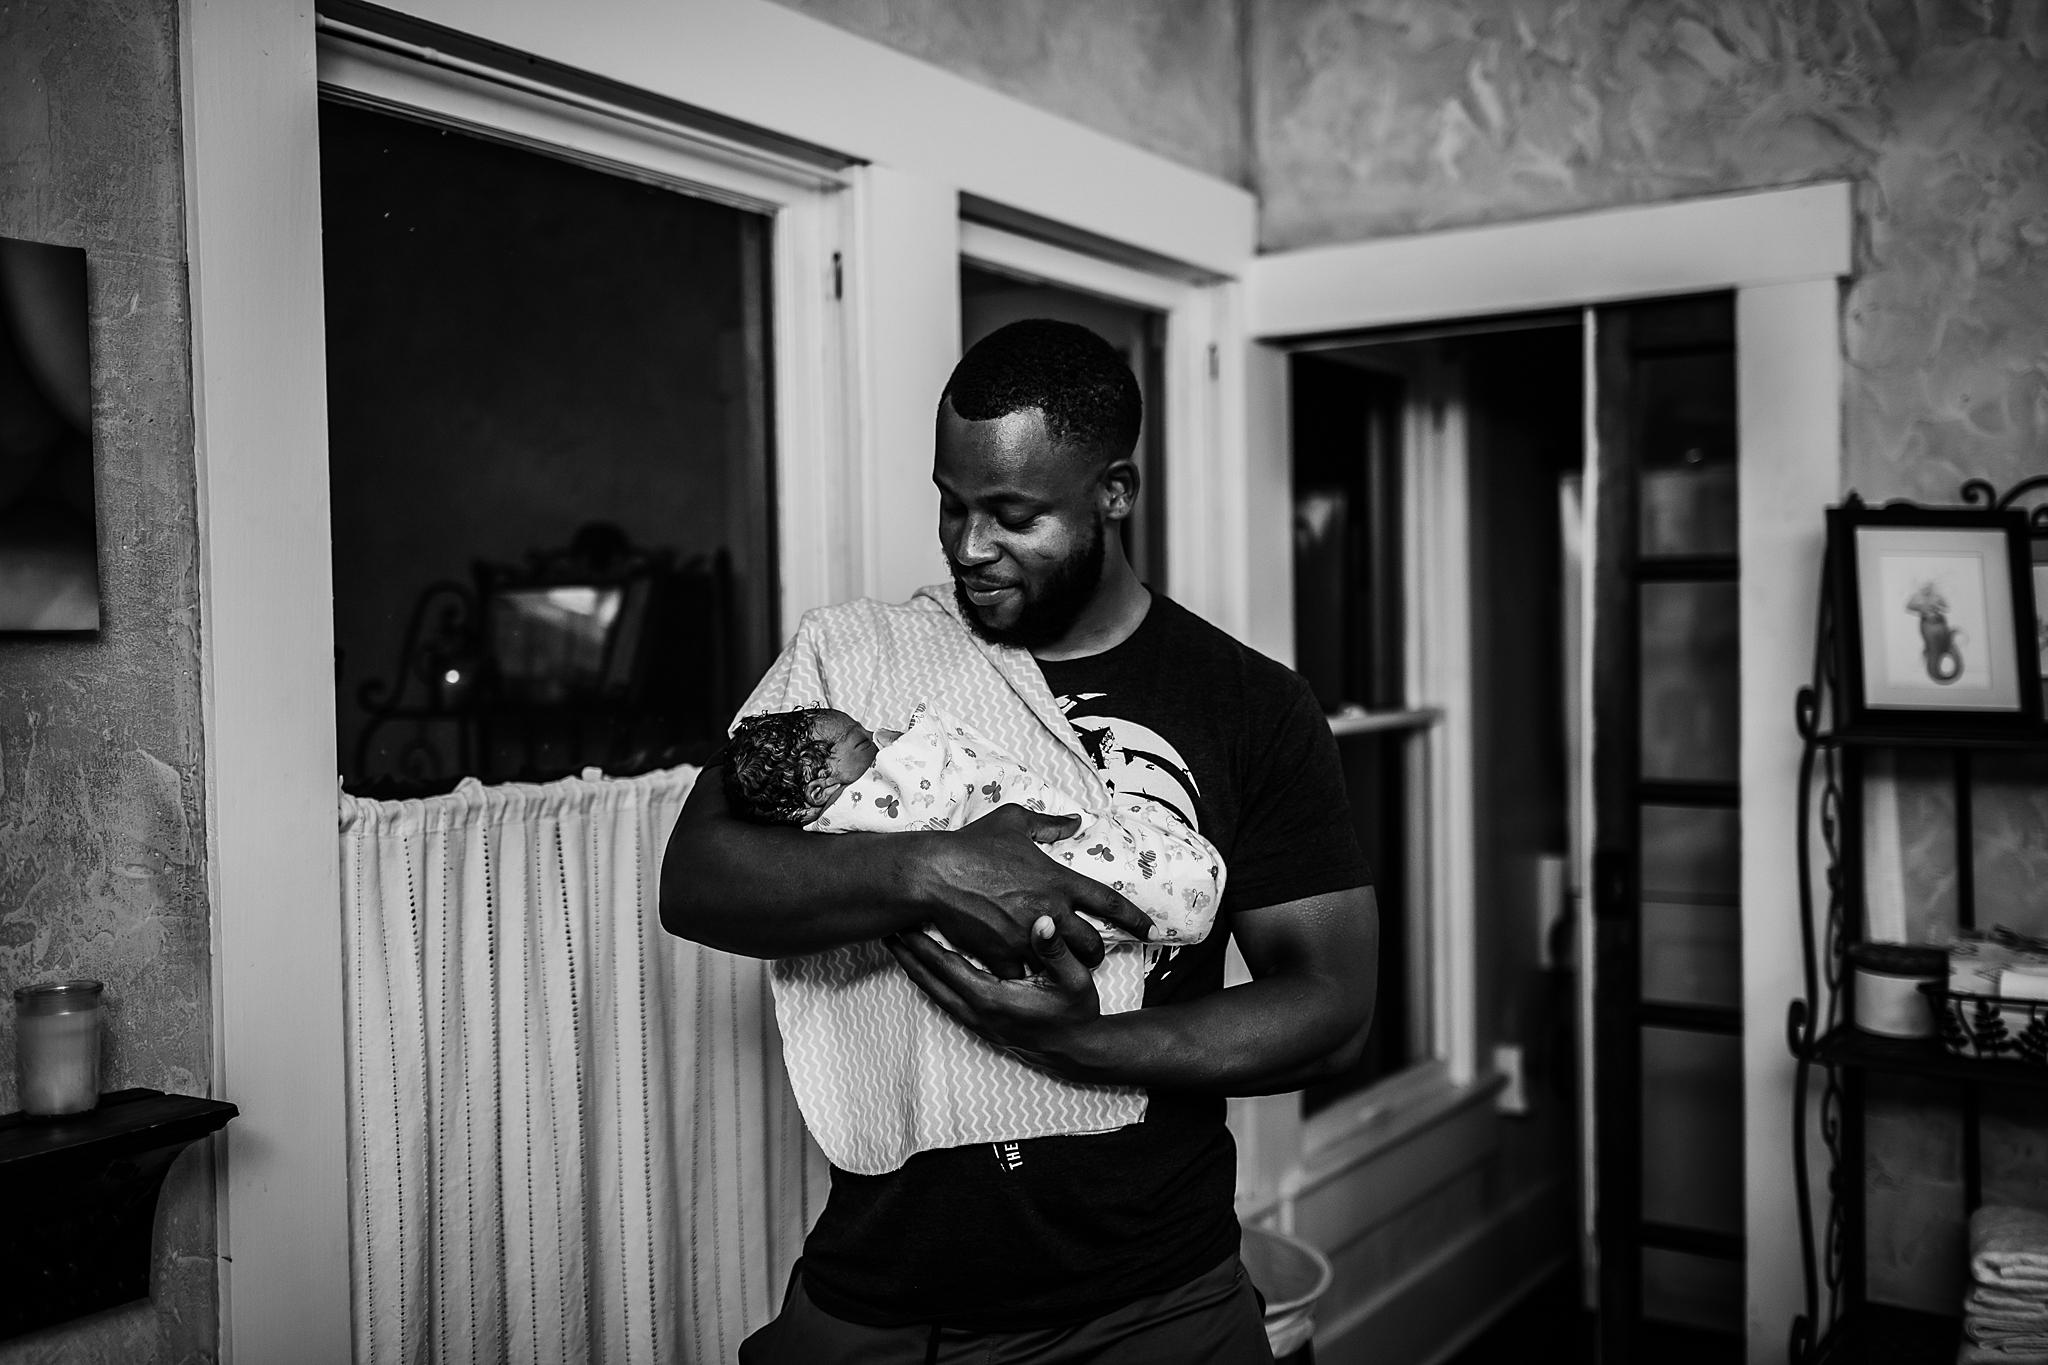 Jessa-San-Antonio-Birth-Photography-127_WEB.jpg